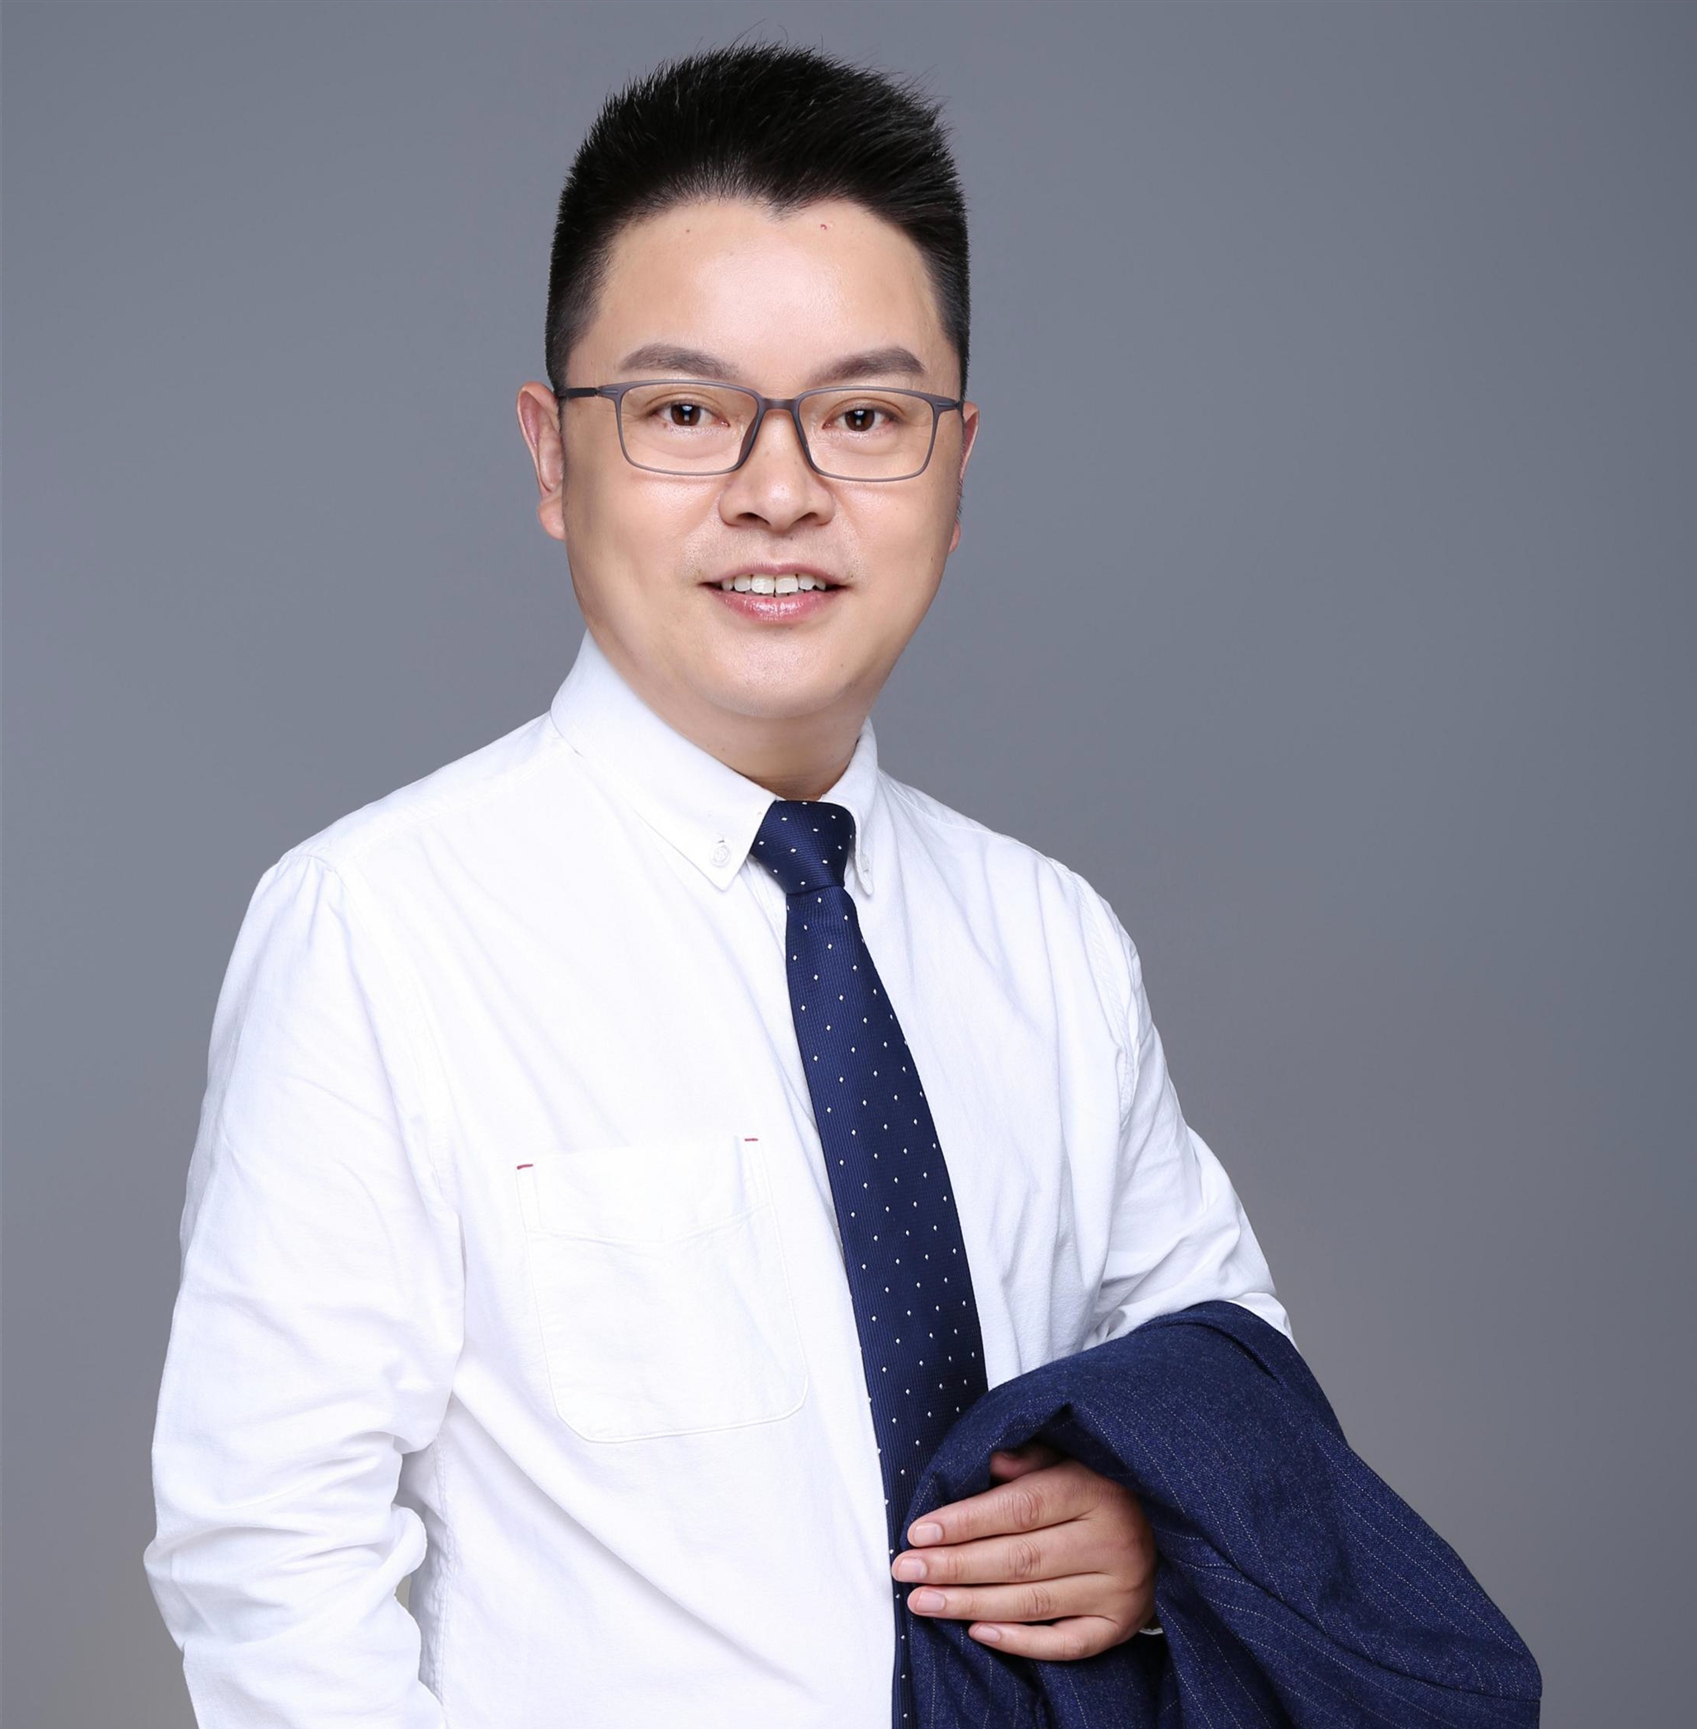 https://saas-chengdu.oss-cn-chengdu.aliyuncs.com/uploads/20200806/0c9272b2dd942d579161d1c4032bd906.jpg